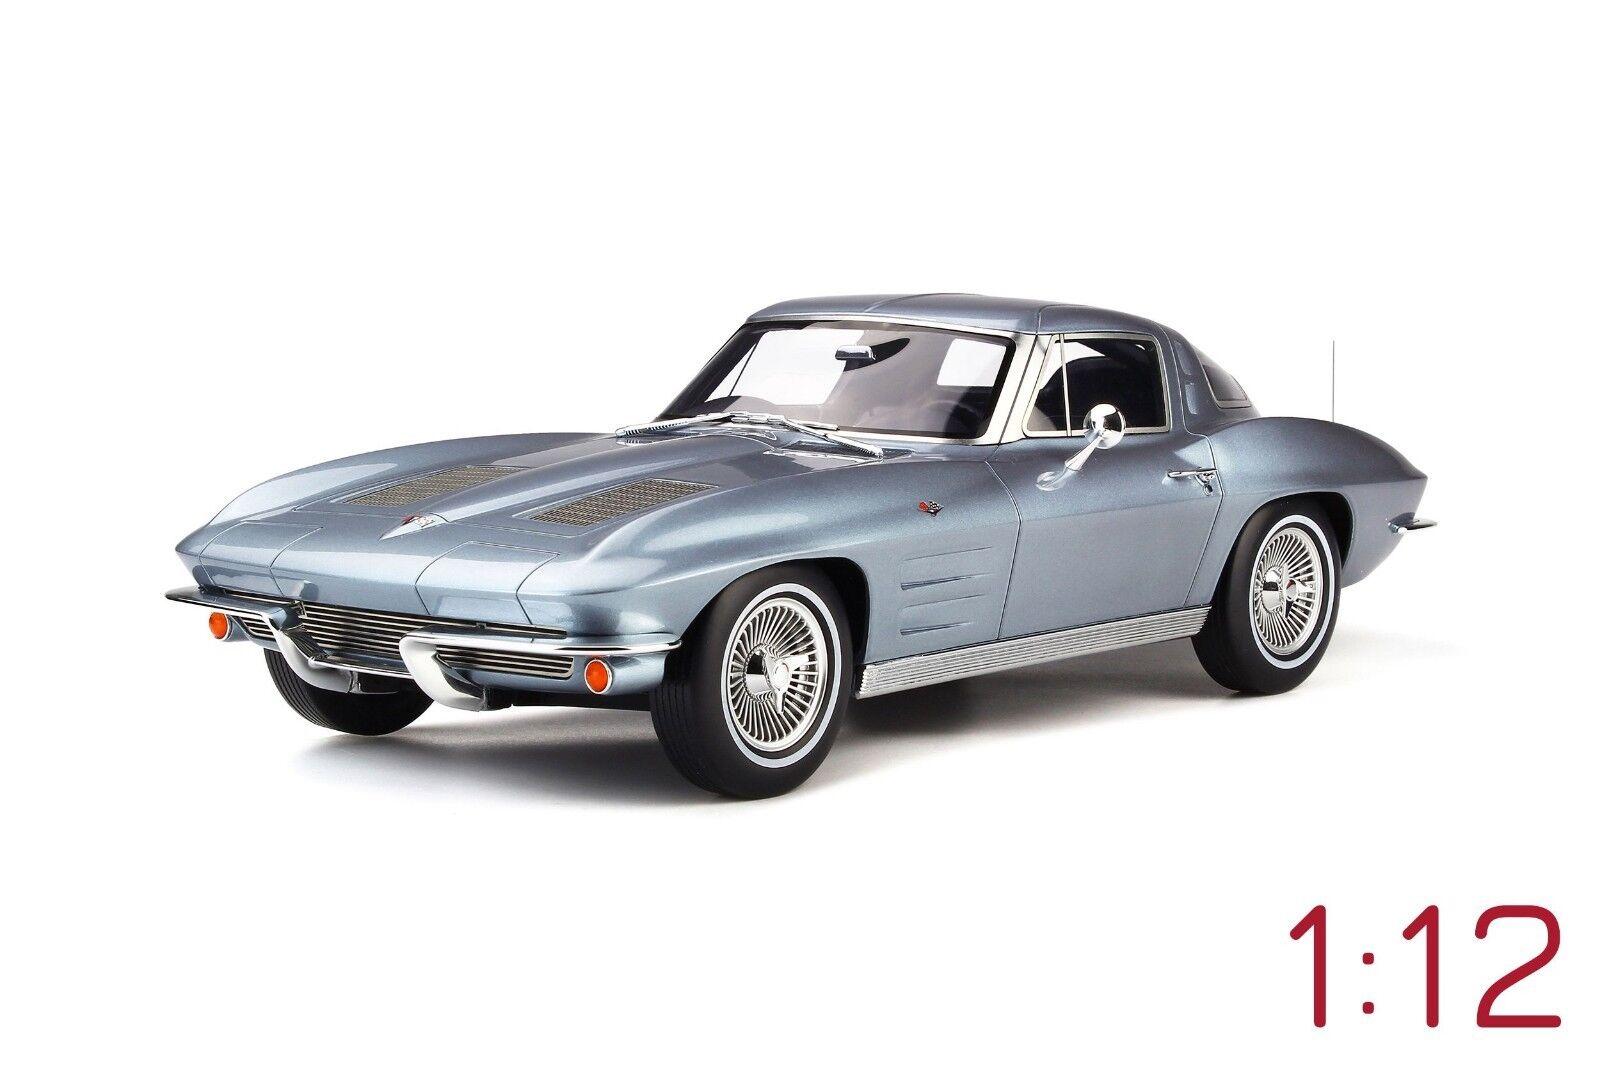 GT Spirit Chevrolet Corvette StinGris 1963 1:12 blu